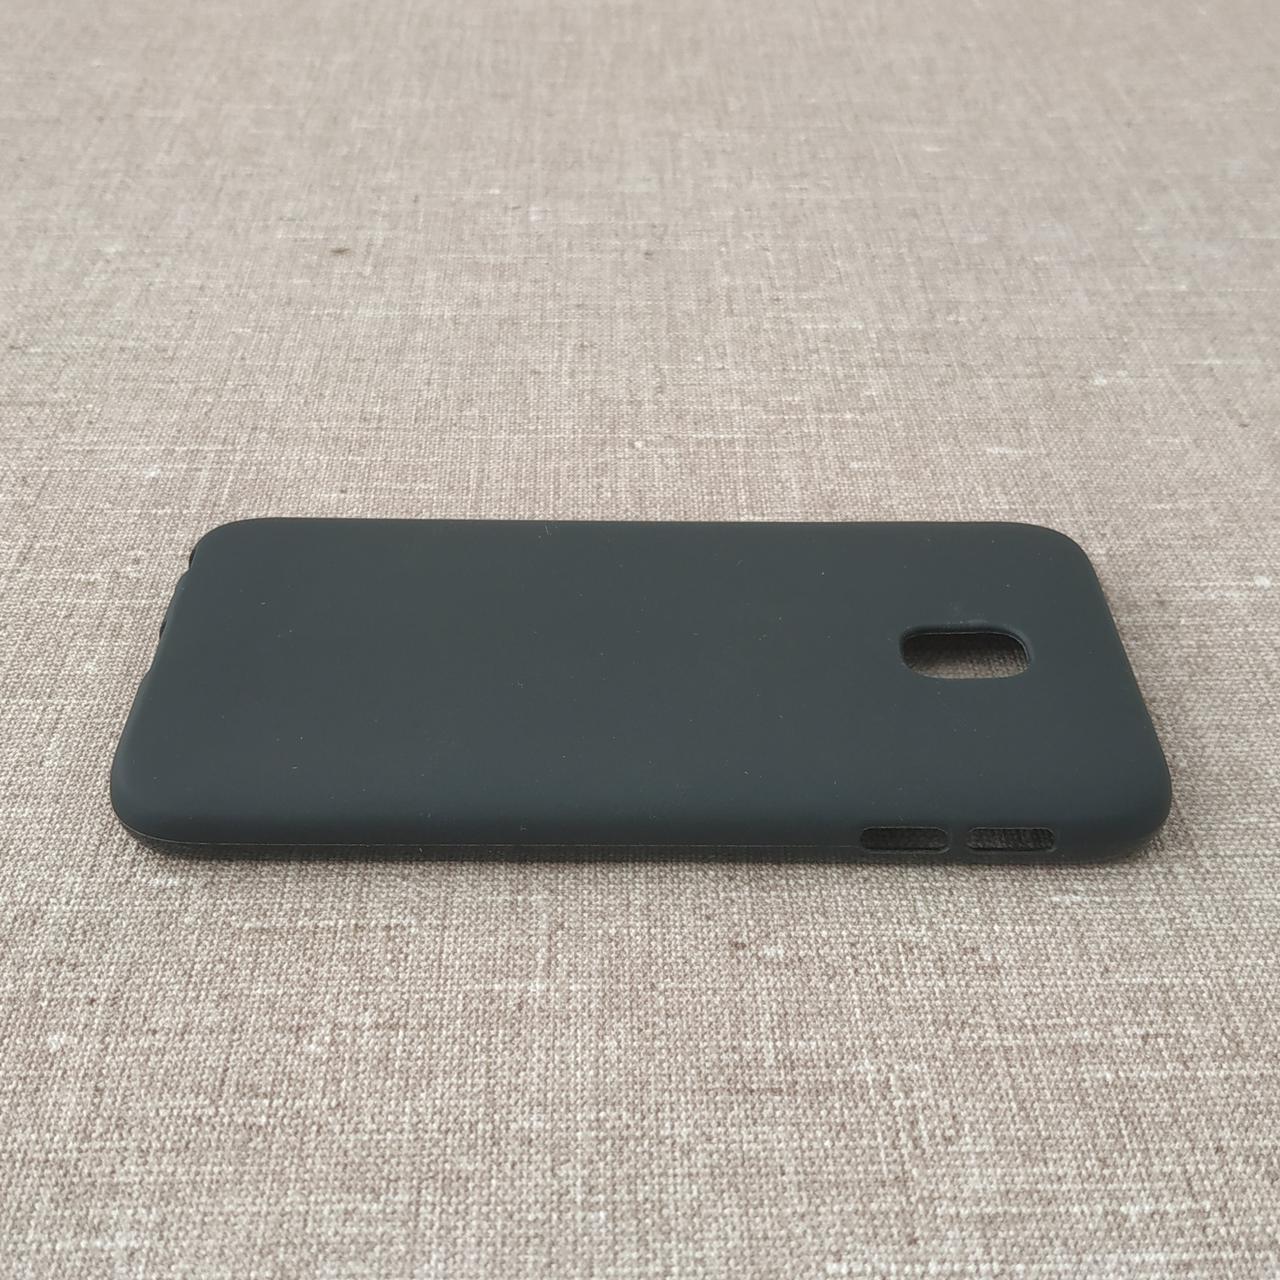 Чехол TPU Samsung Galaxy J330 black J3 (J330) 2017 Для телефона Черный